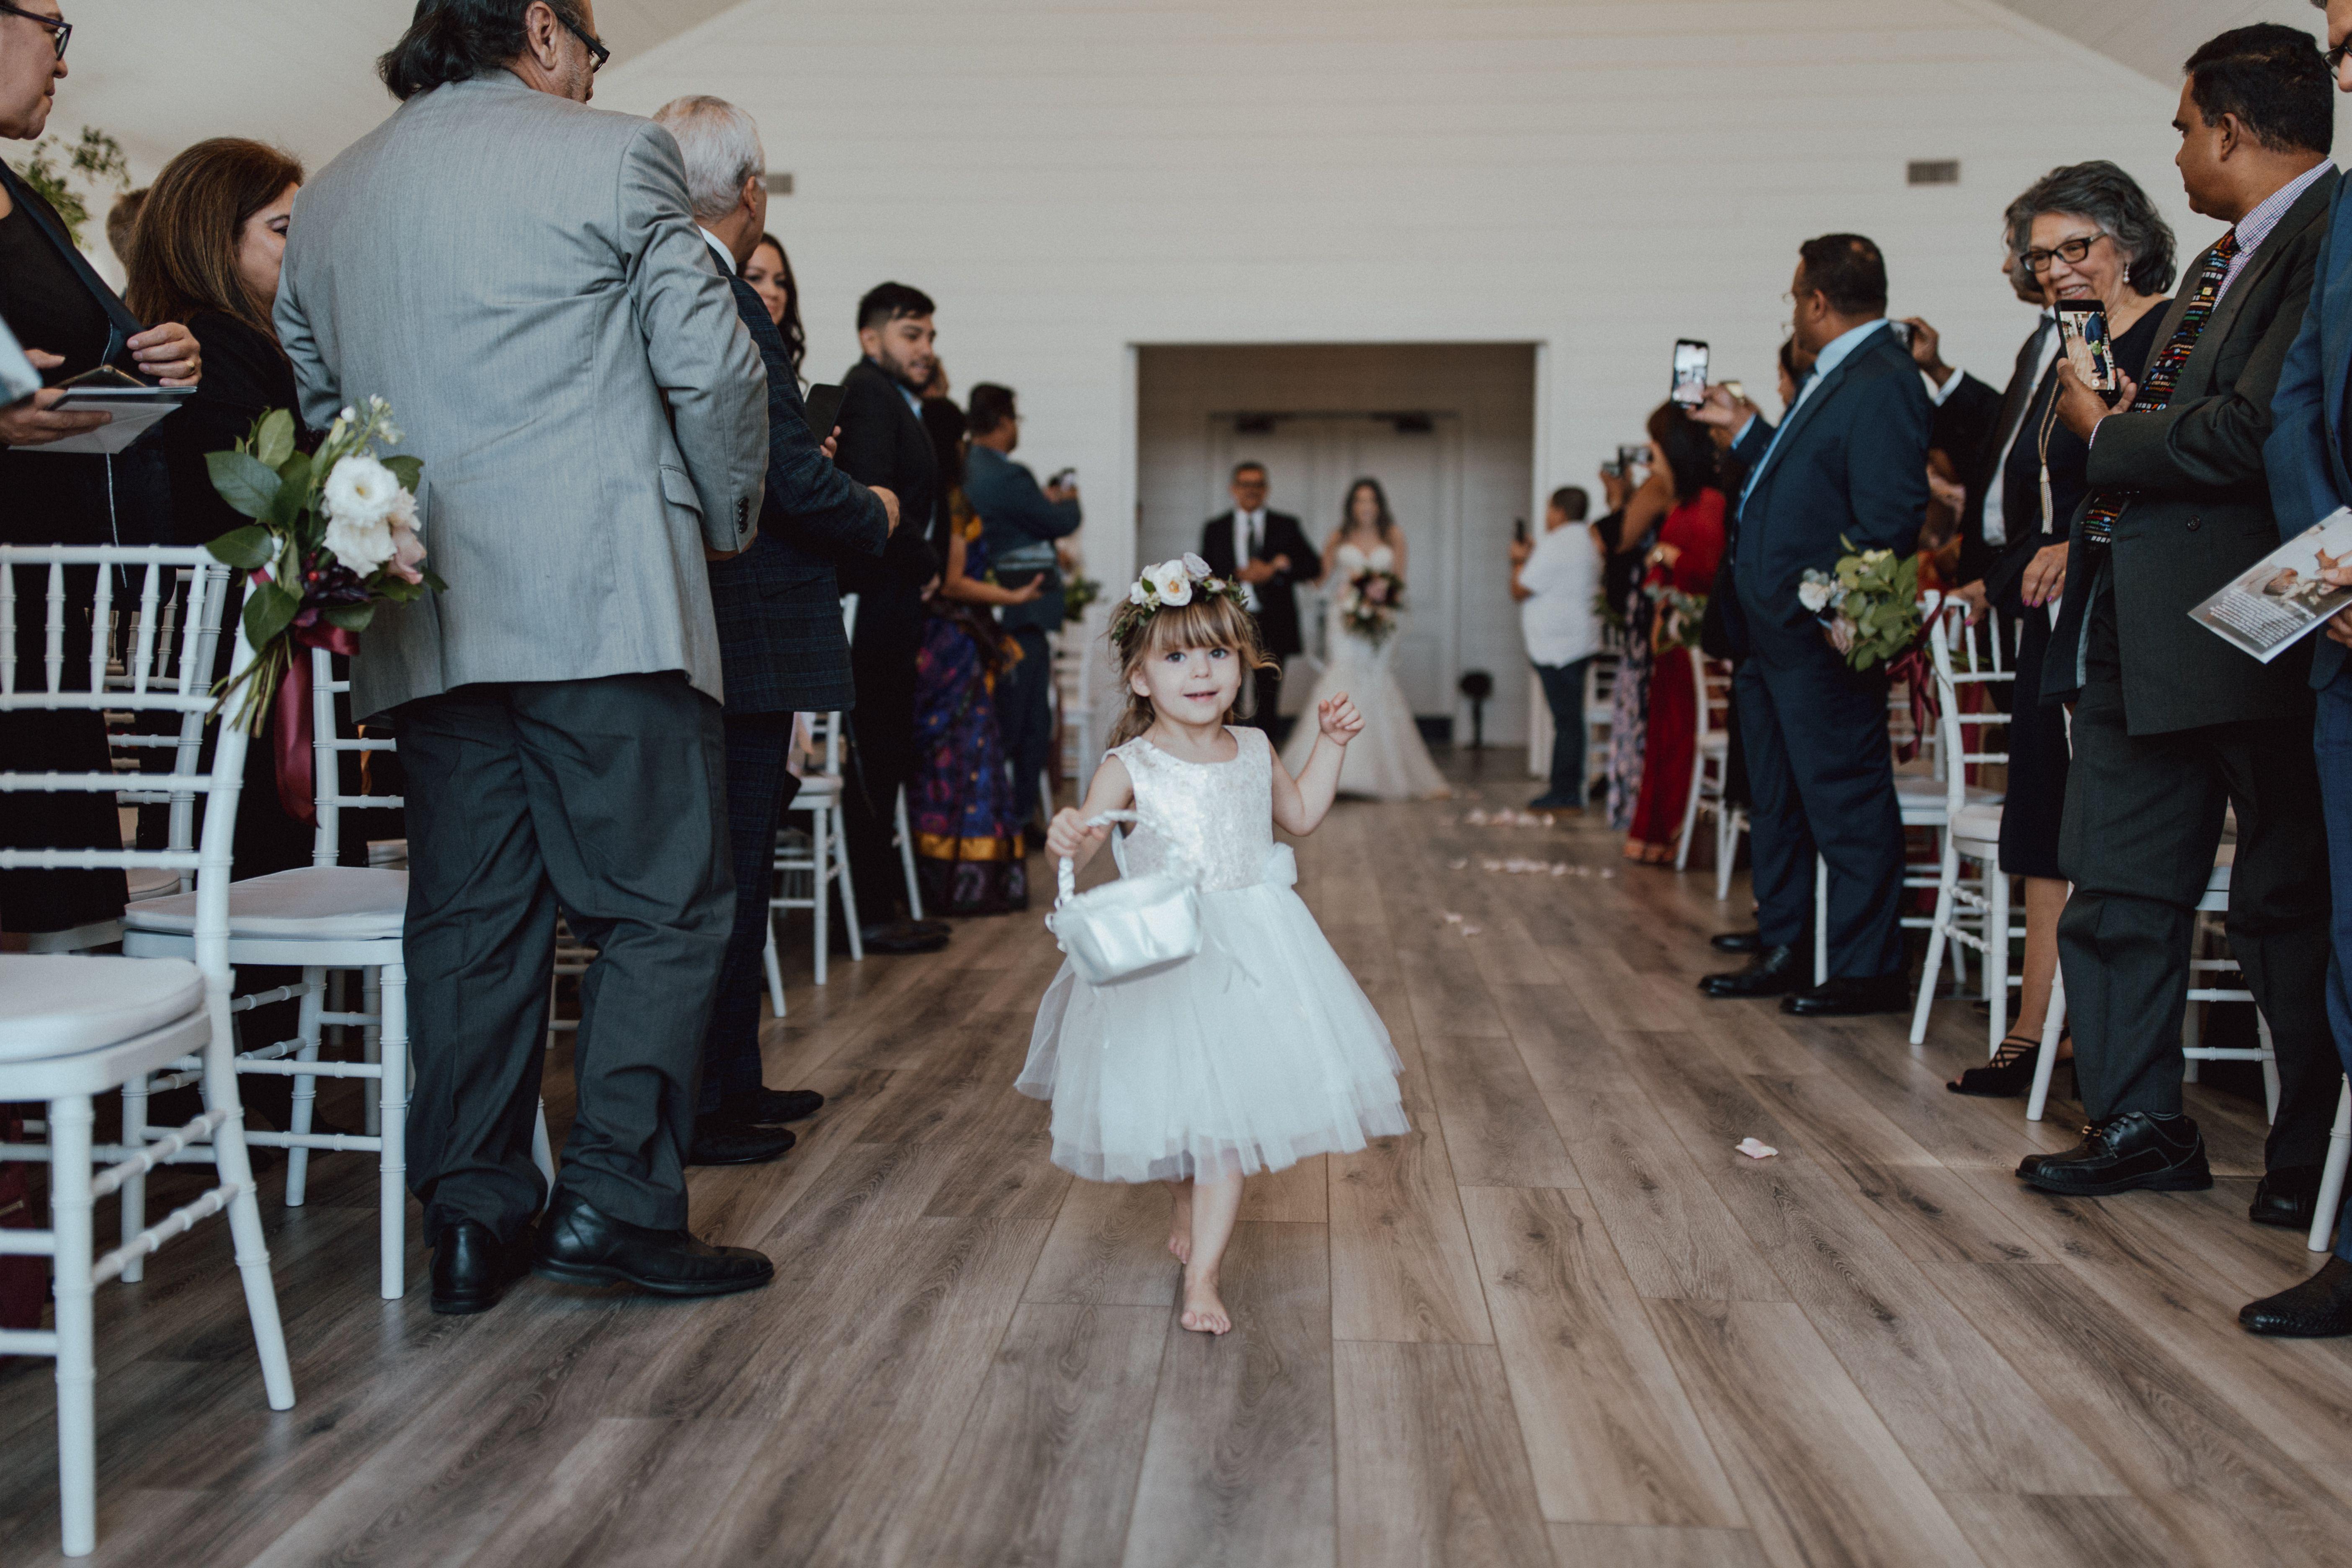 Our Wedding Hey Wendy Vanessa In 2020 Flower Girl Dresses Wedding Dresses Groom And Groomsmen Attire